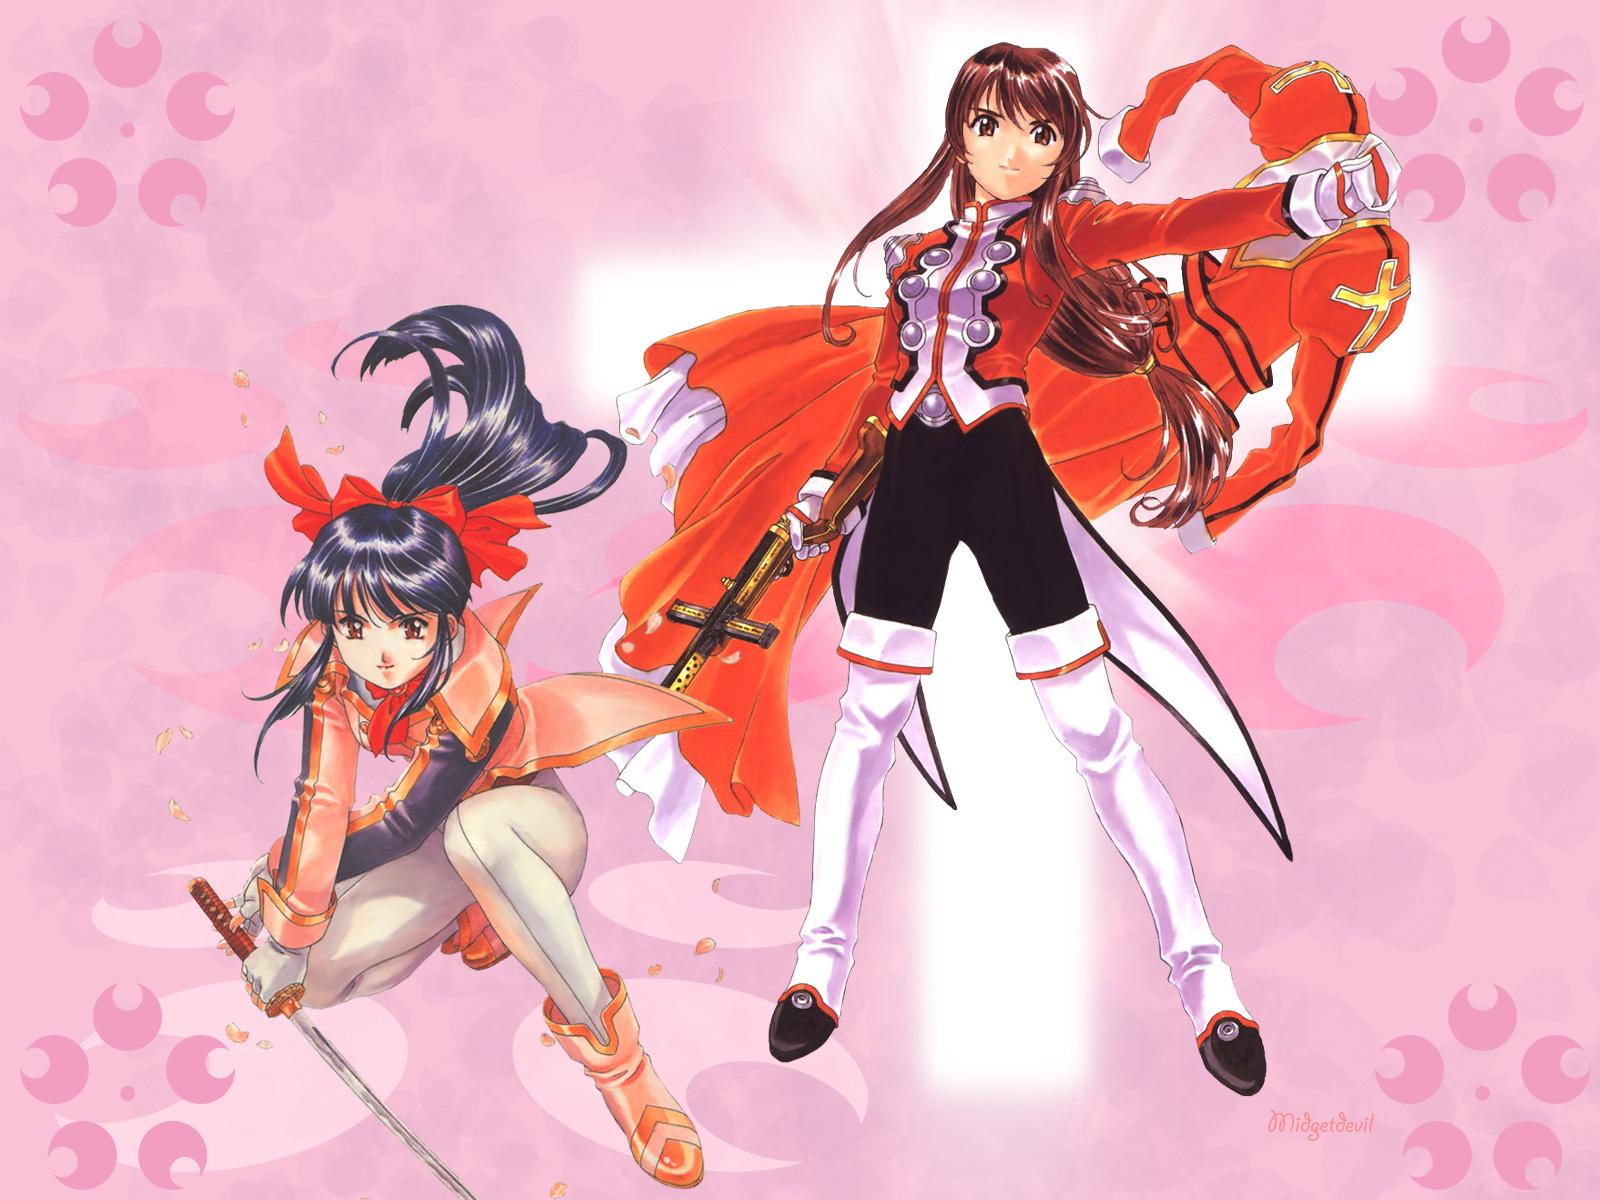 Sakura Wars 1600x1200 Anime Wallpapers Anime Wallpapers